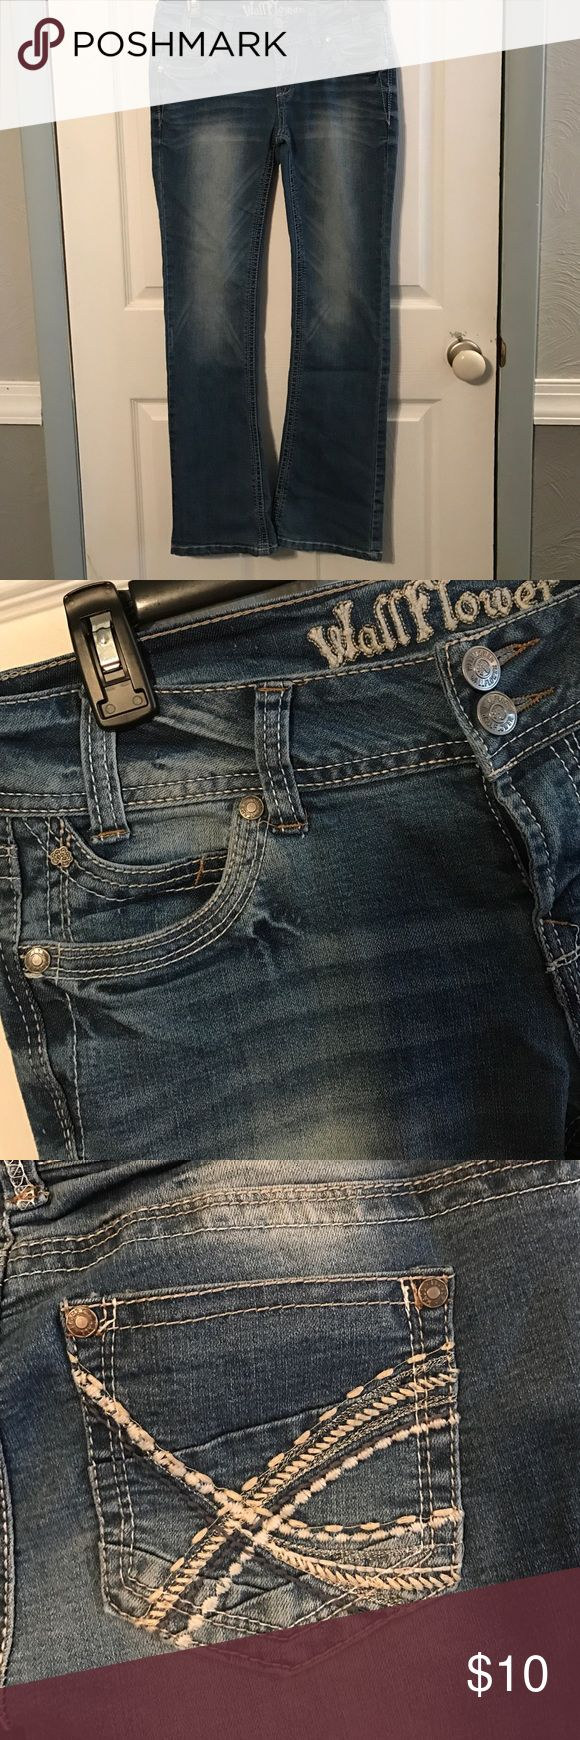 Wallflower jeans, size 7 Wallflower jeans, size 7, boot cut, detailed pockets Wallflower Jeans Boot Cut